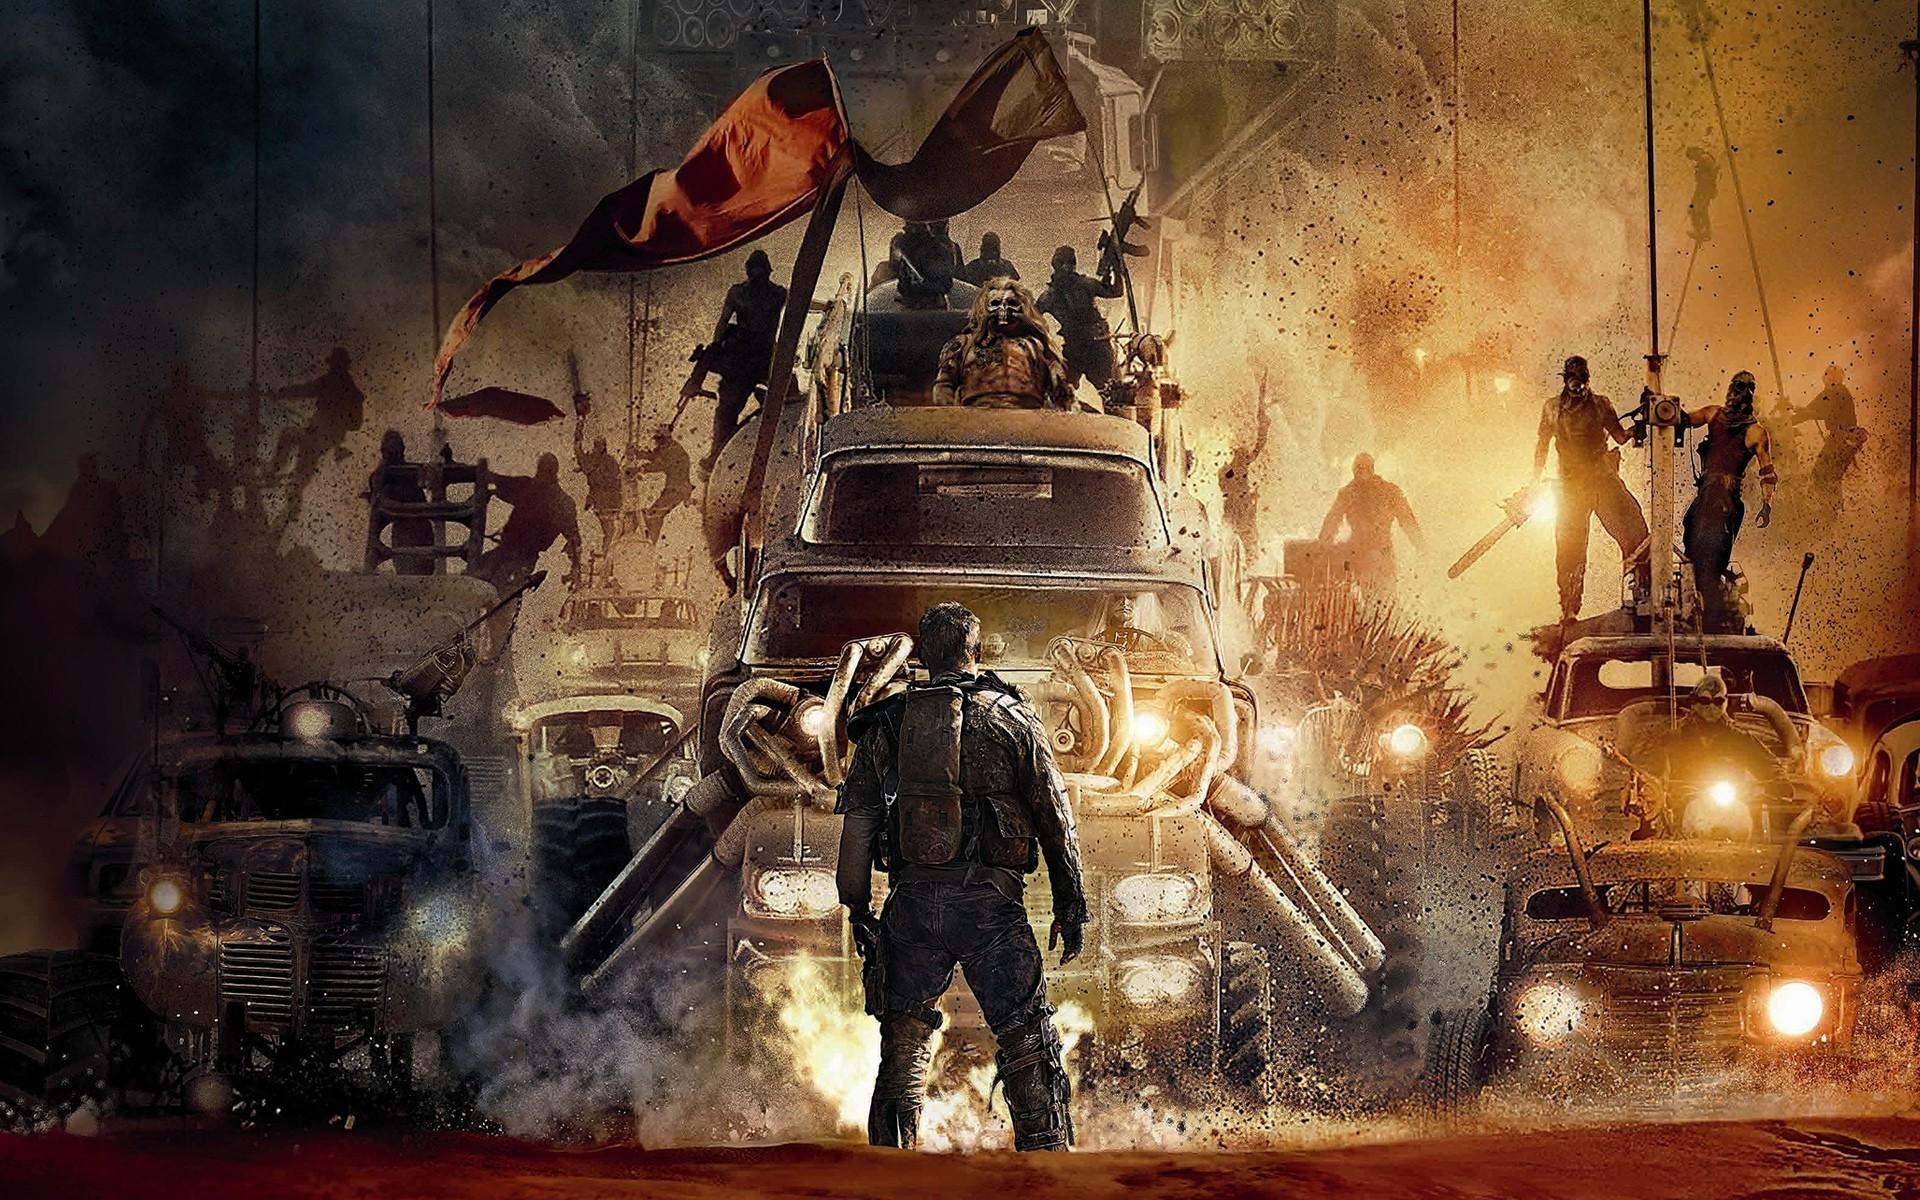 1920x1200 px Mad Max Mad Max Fury Road movies